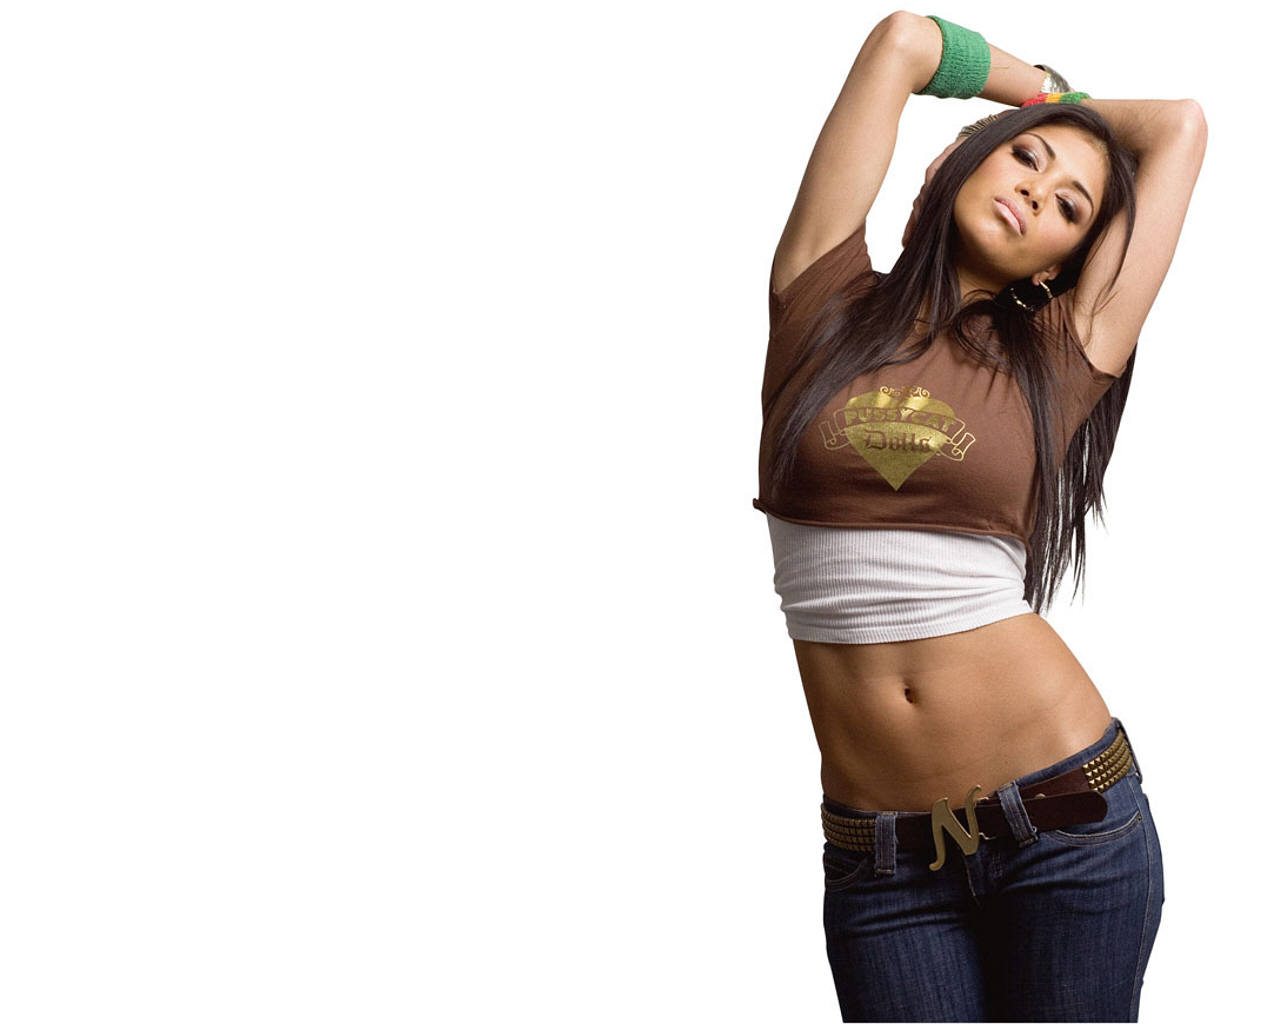 MegaTopStars - Nicole Scherzinger :: biography ... Nicole Scherzinger Discography